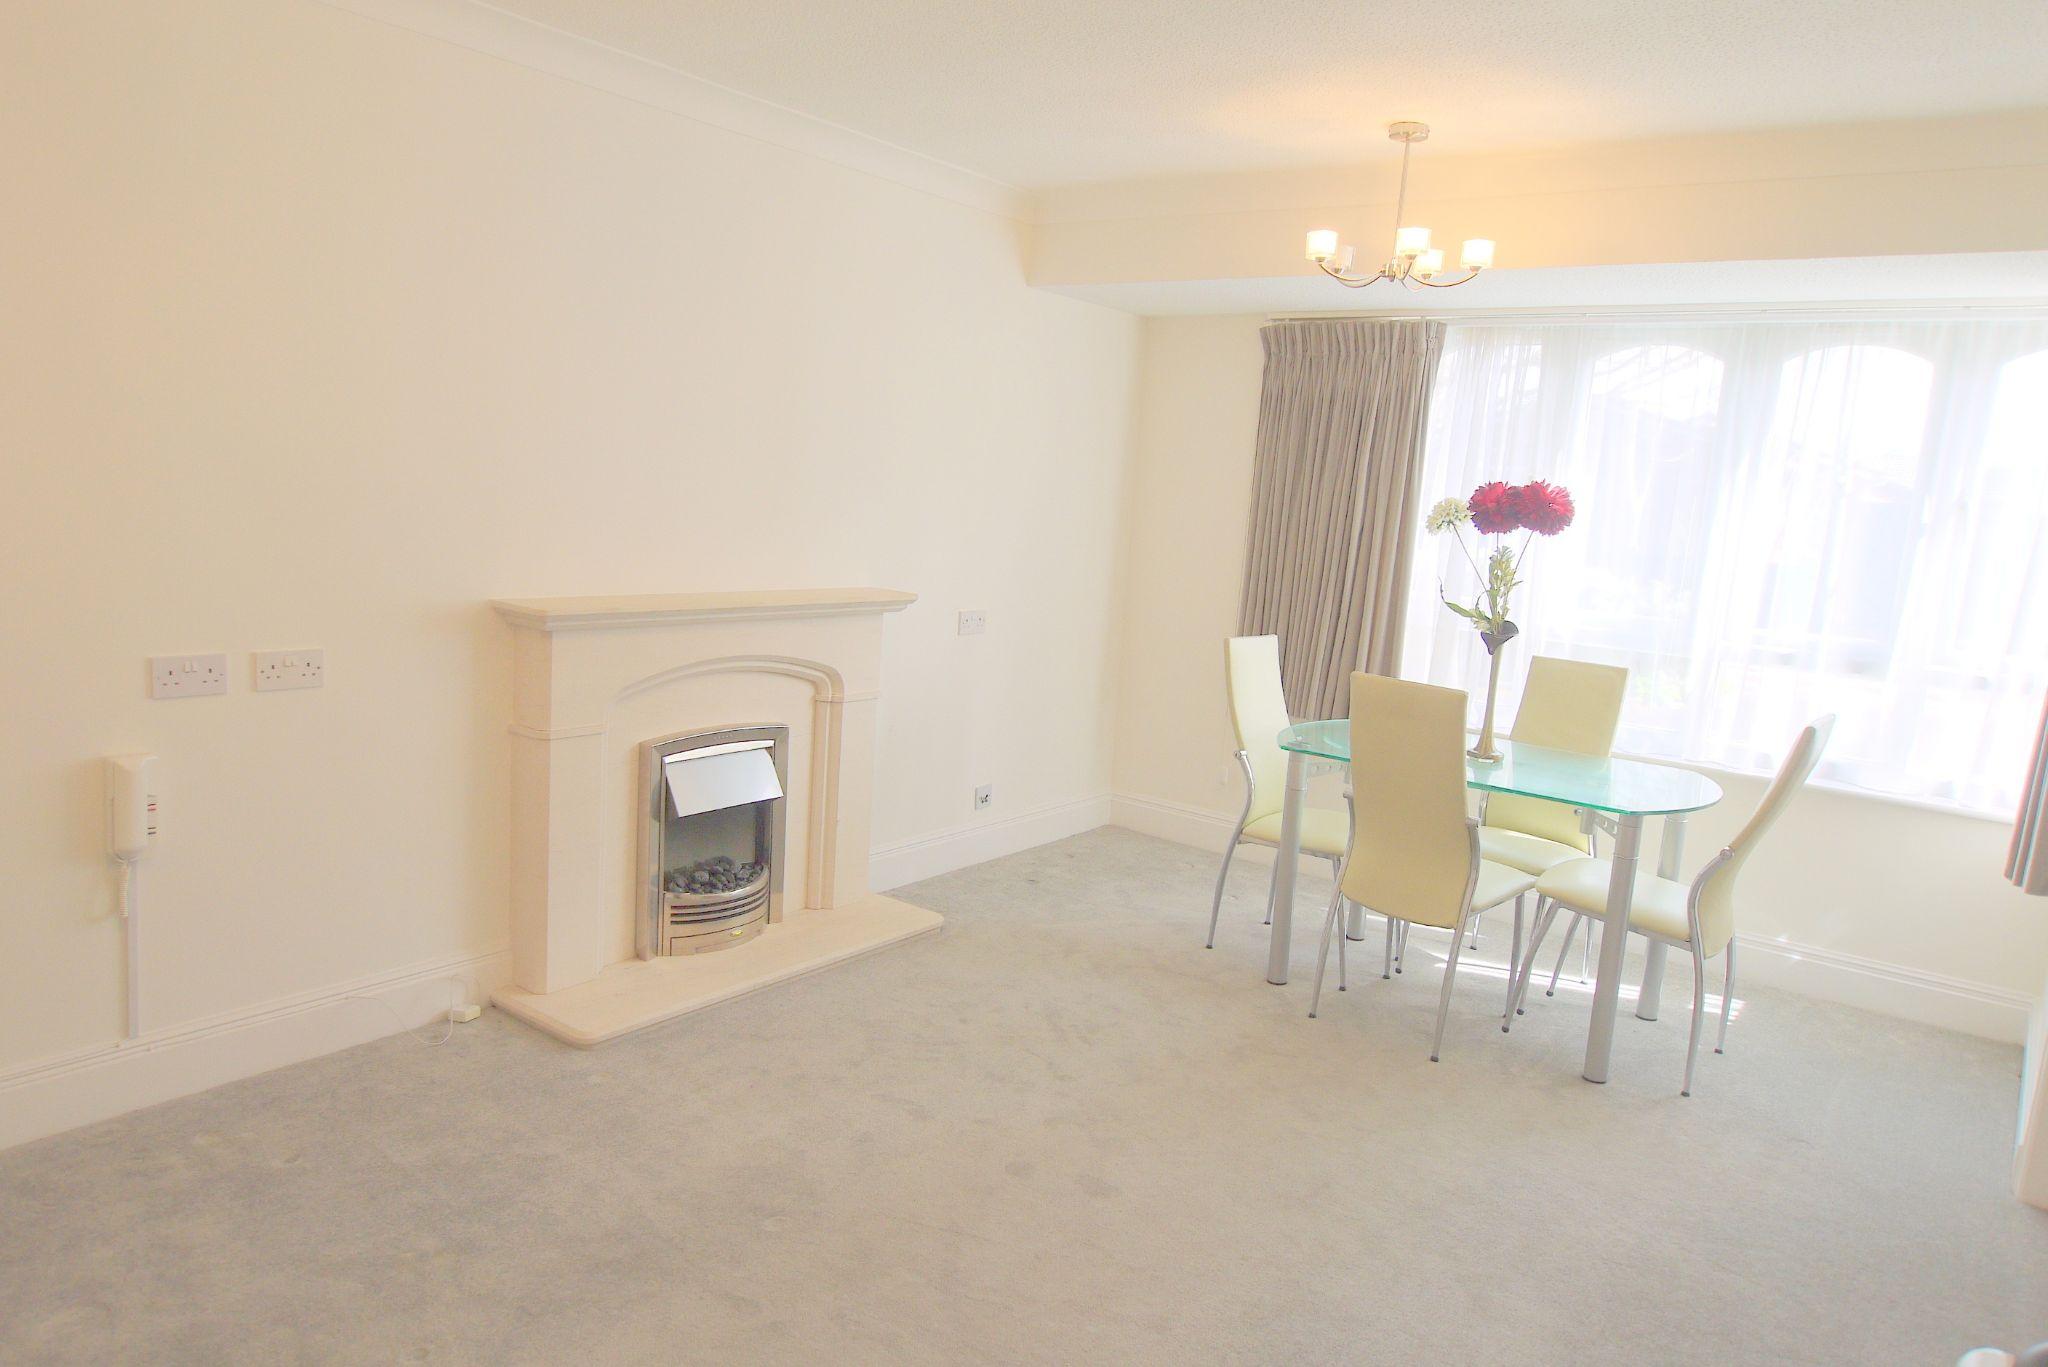 1 bedroom apartment For Sale in Sevenoaks - Photograph 2